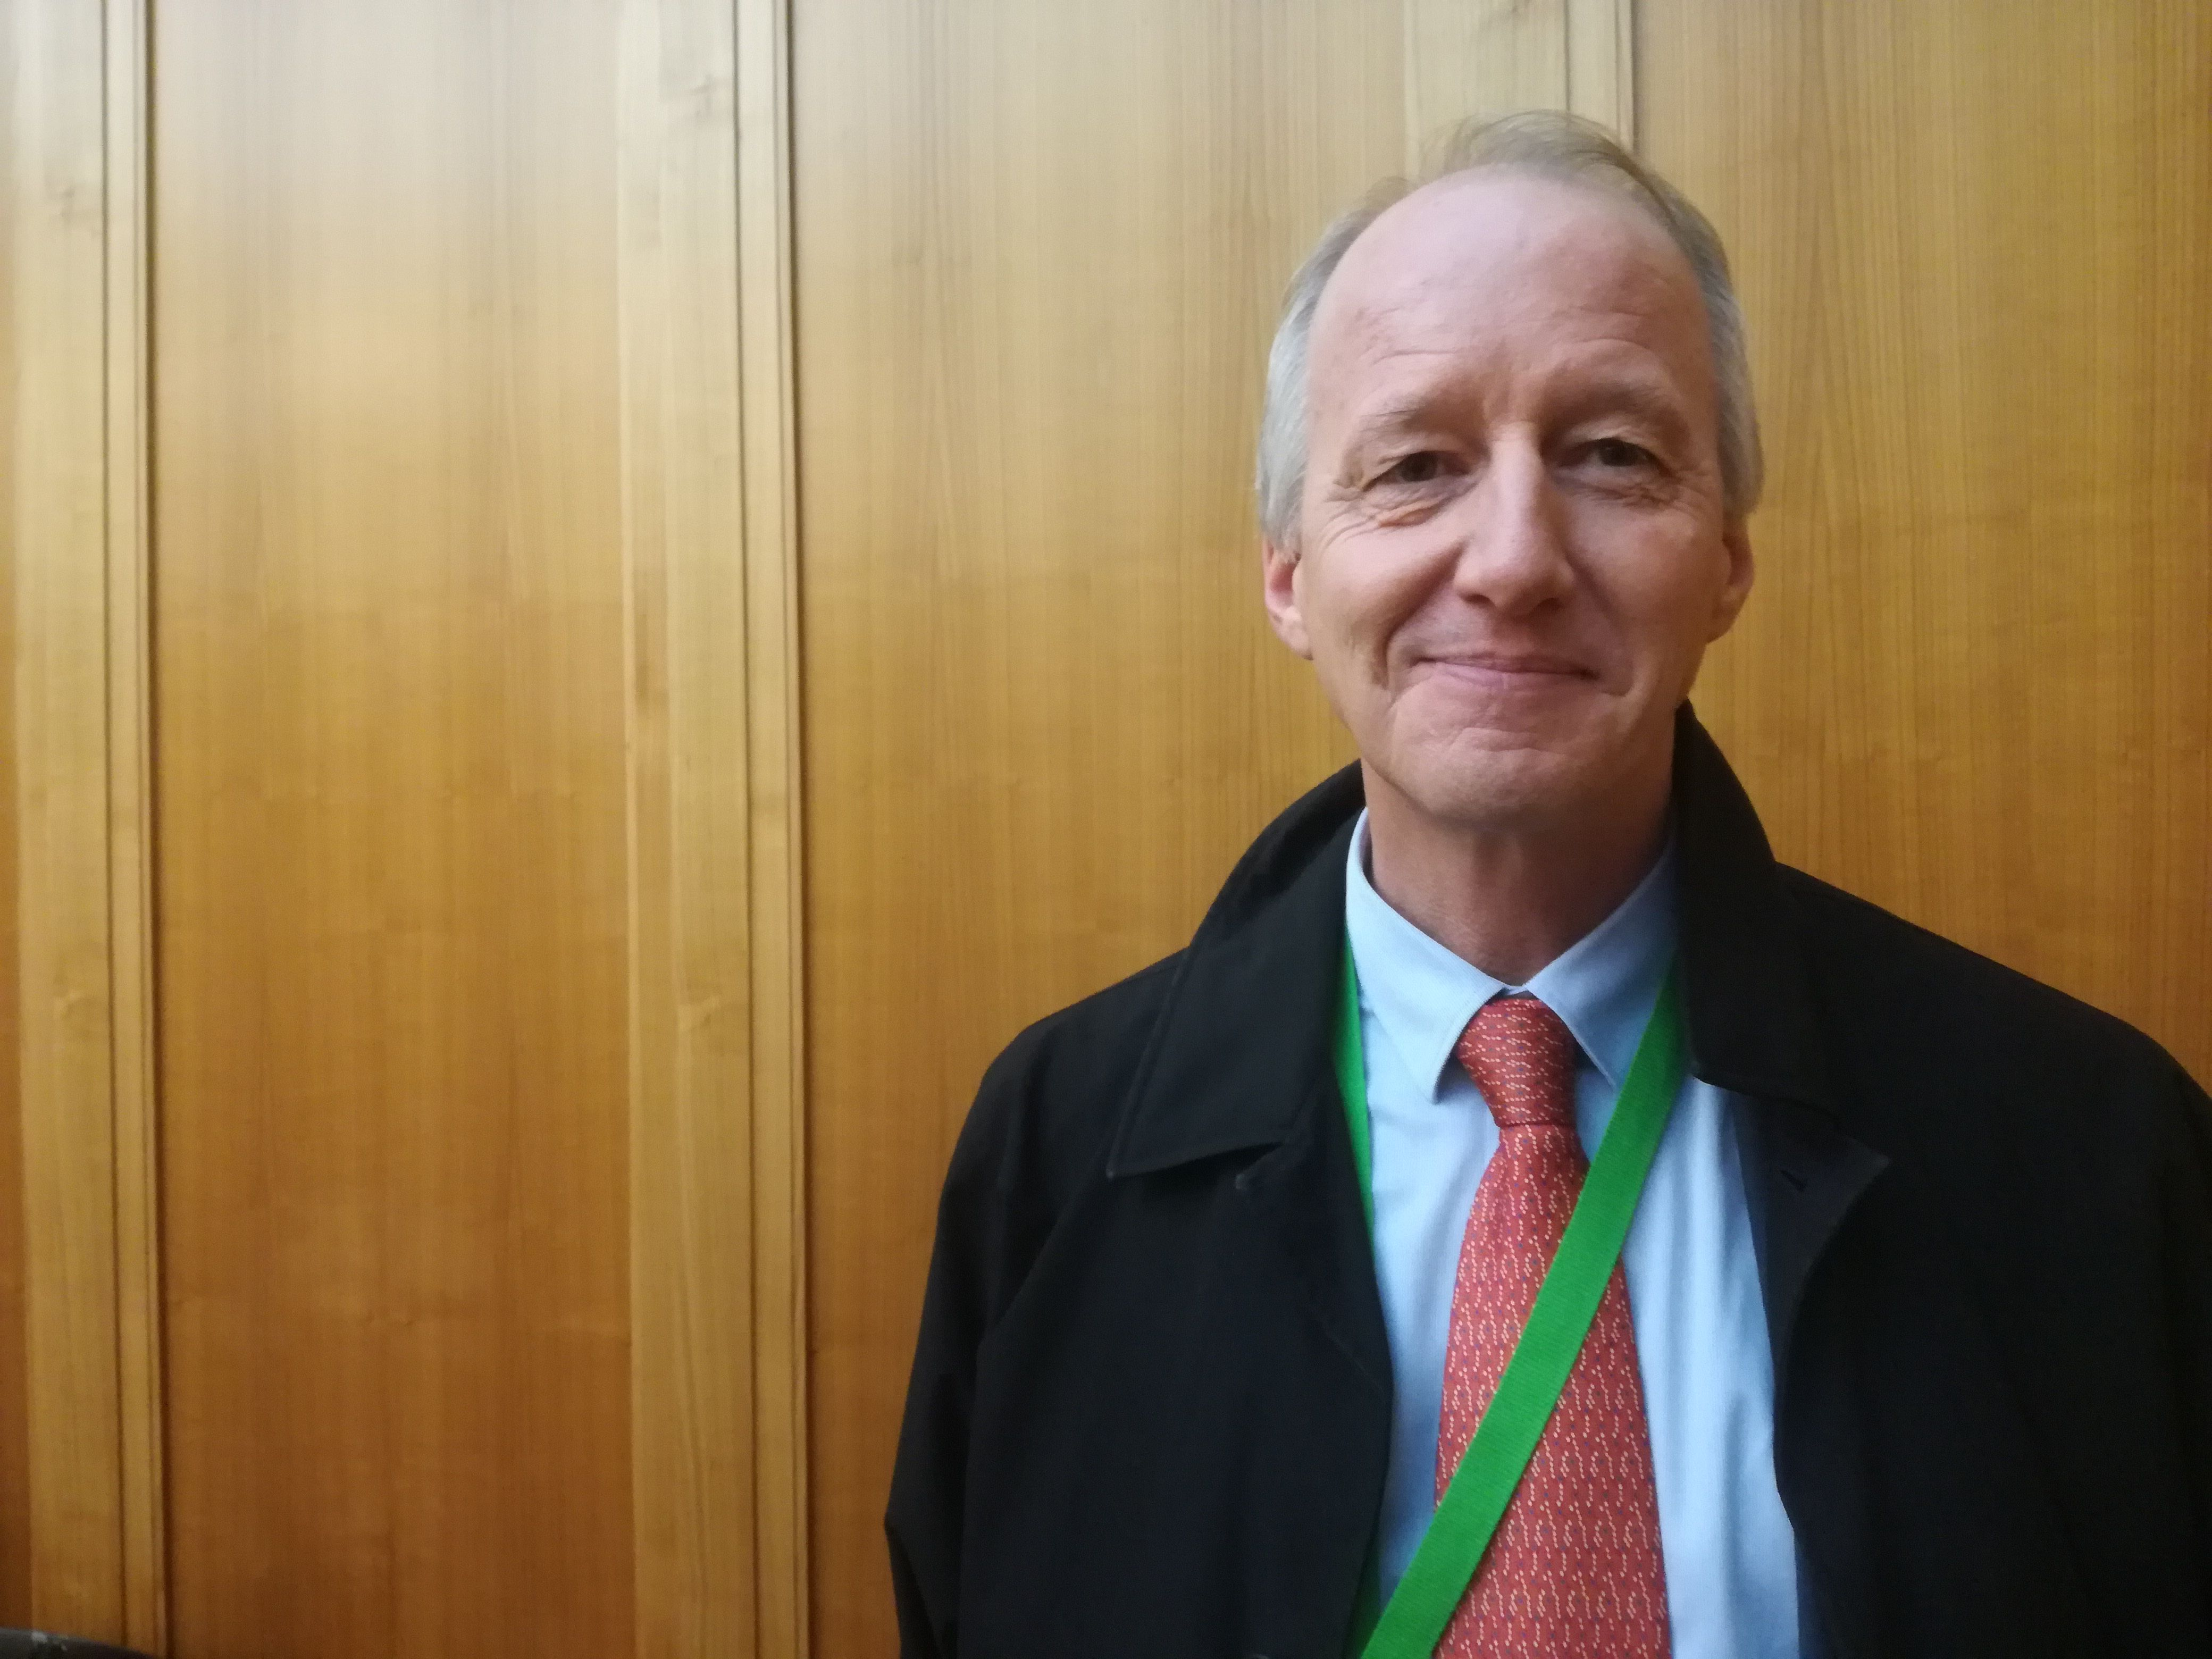 Henning Wuester